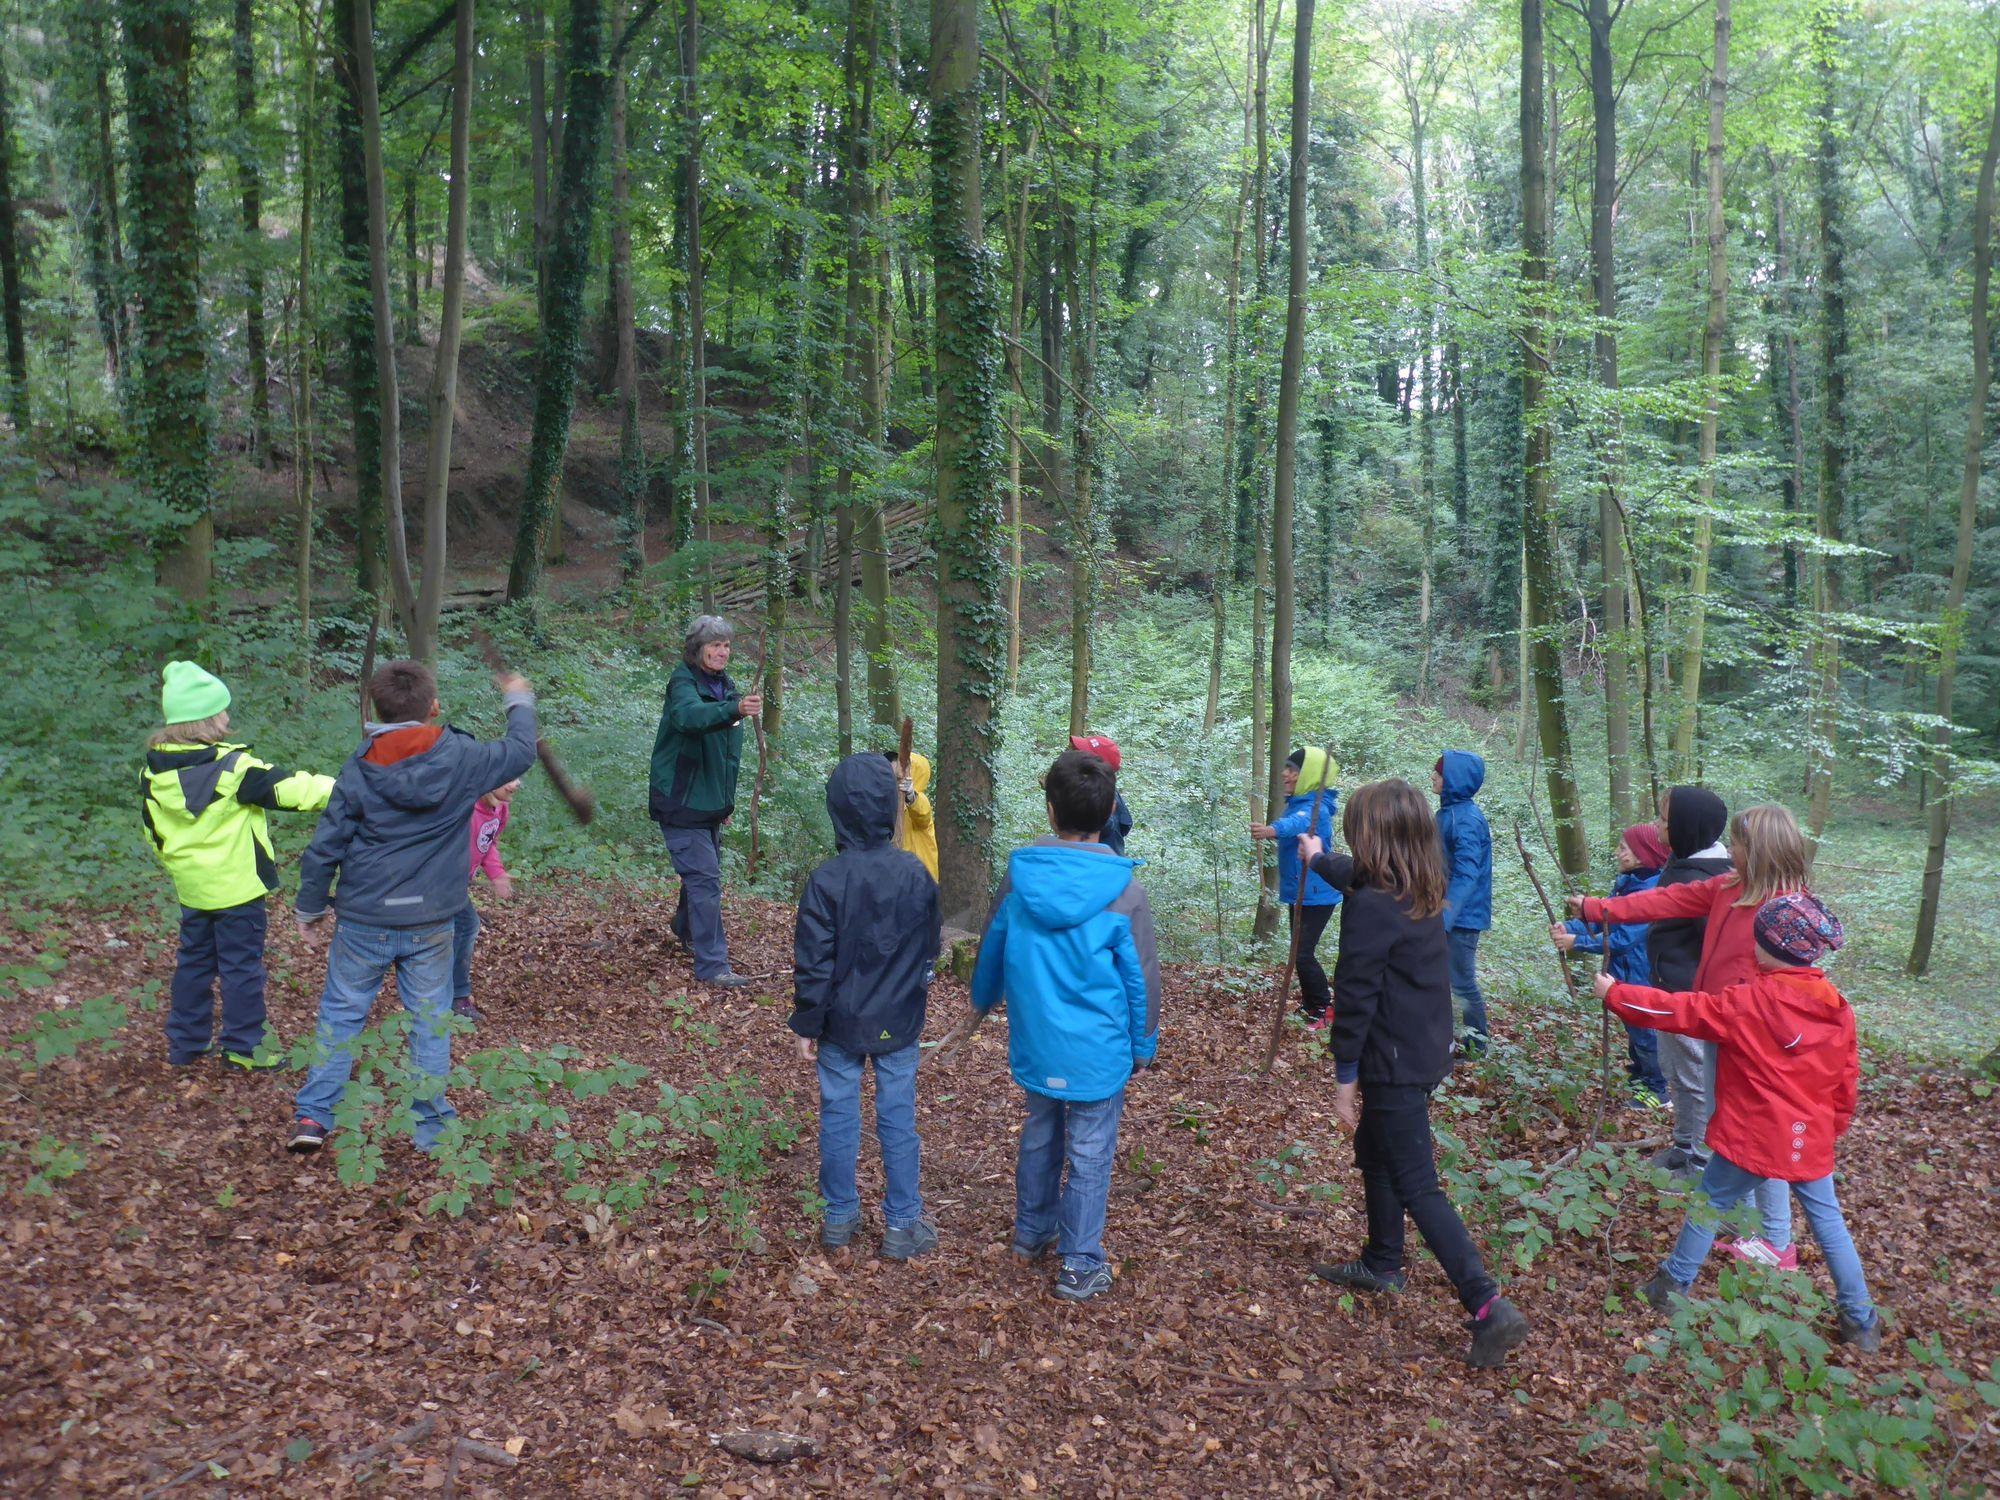 Kinder Ausflug Wald 01